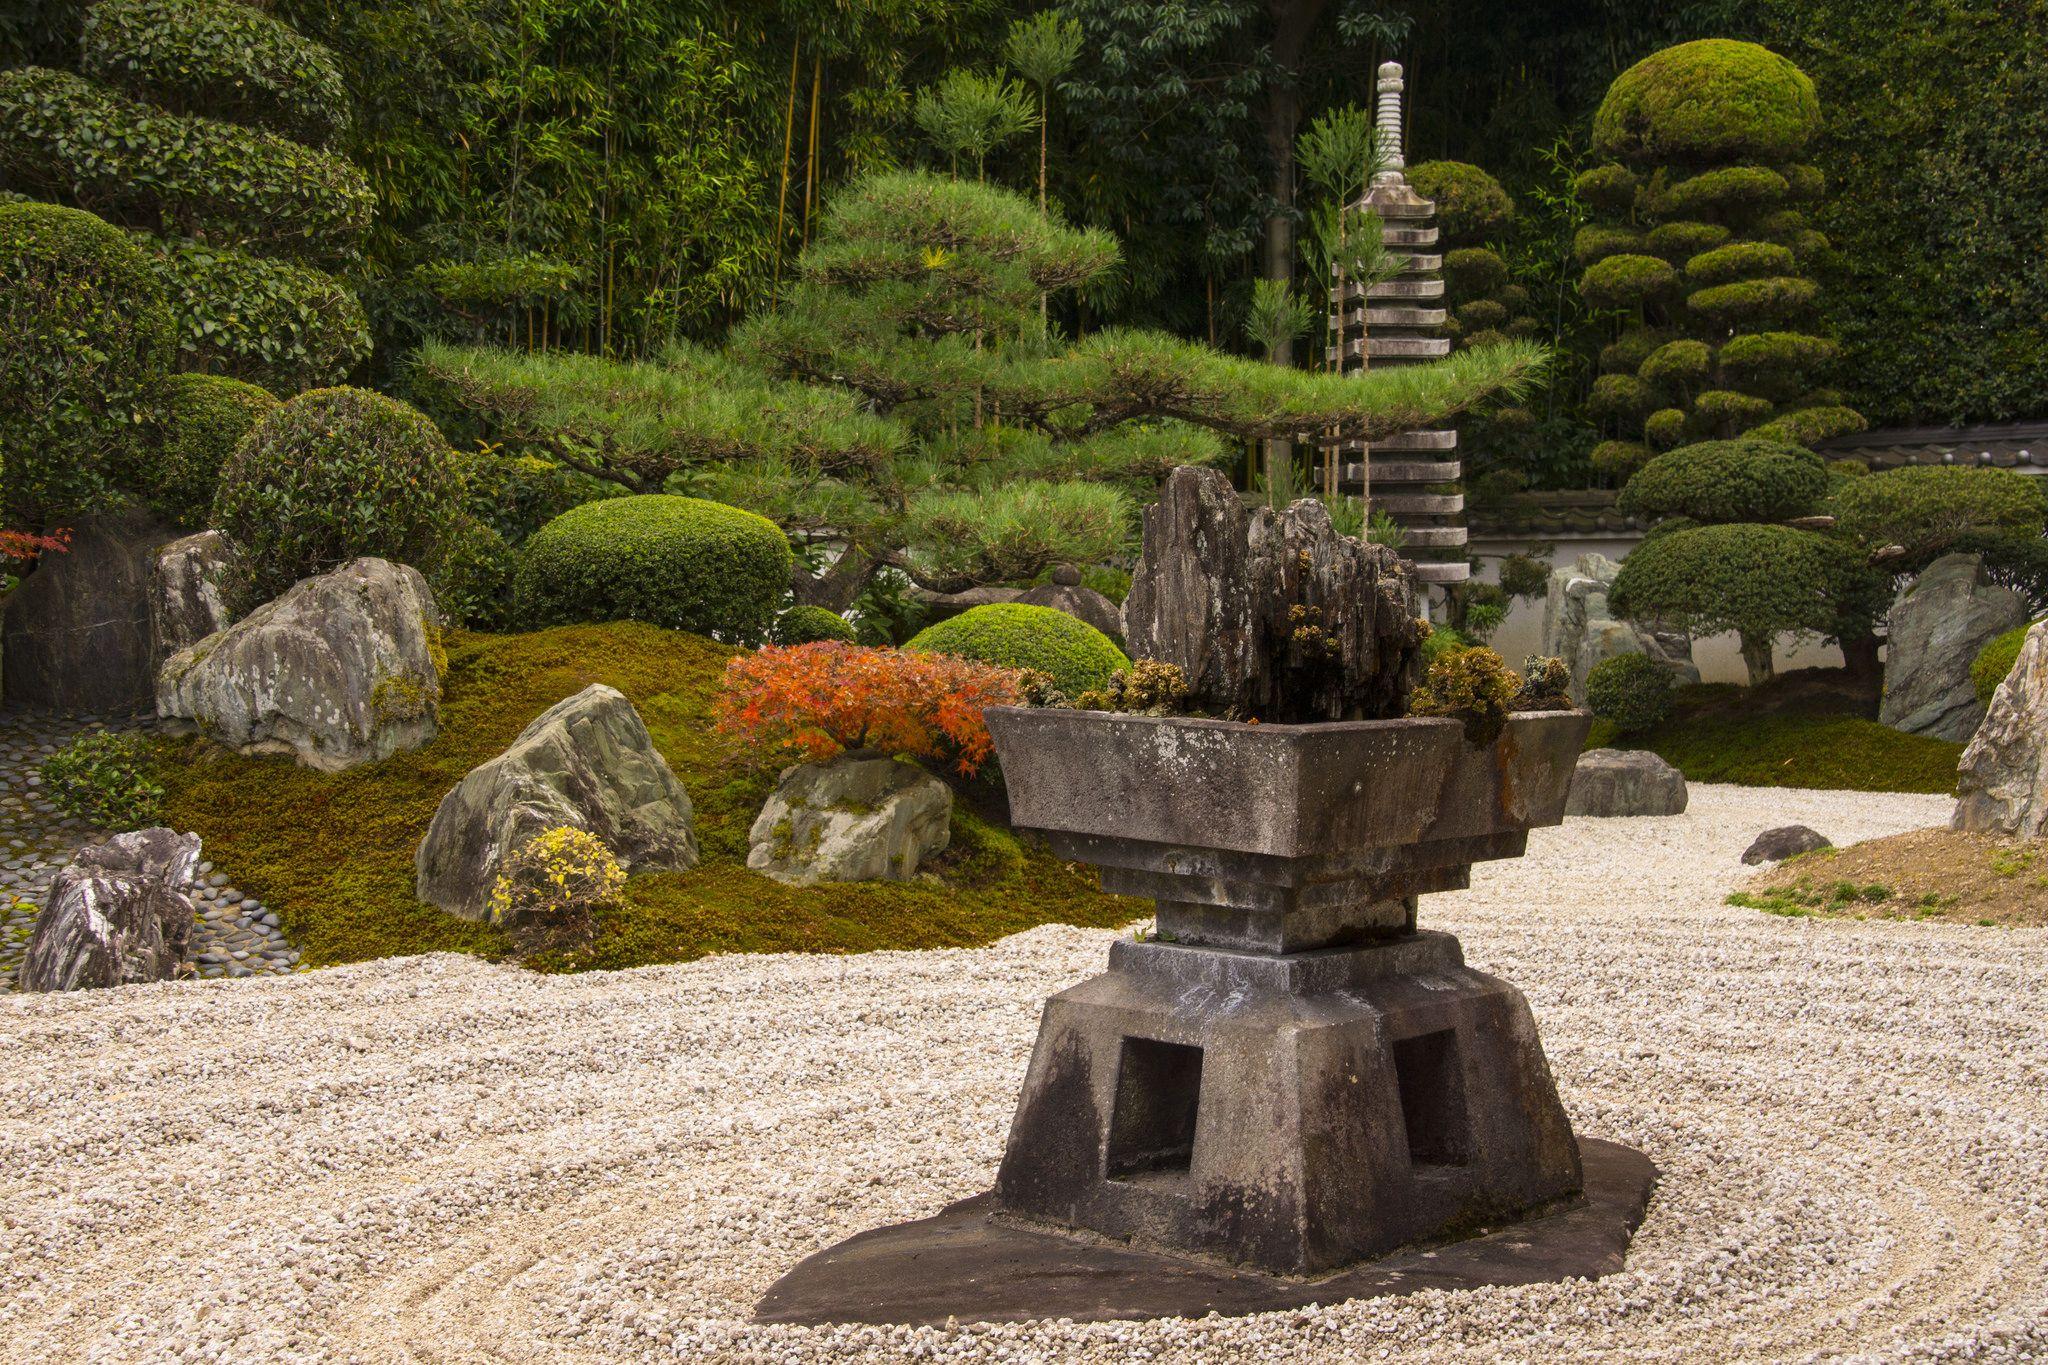 東福寺 霊雲院 九山八海の庭 / Japanese Garden of Tohuku-ji Temple